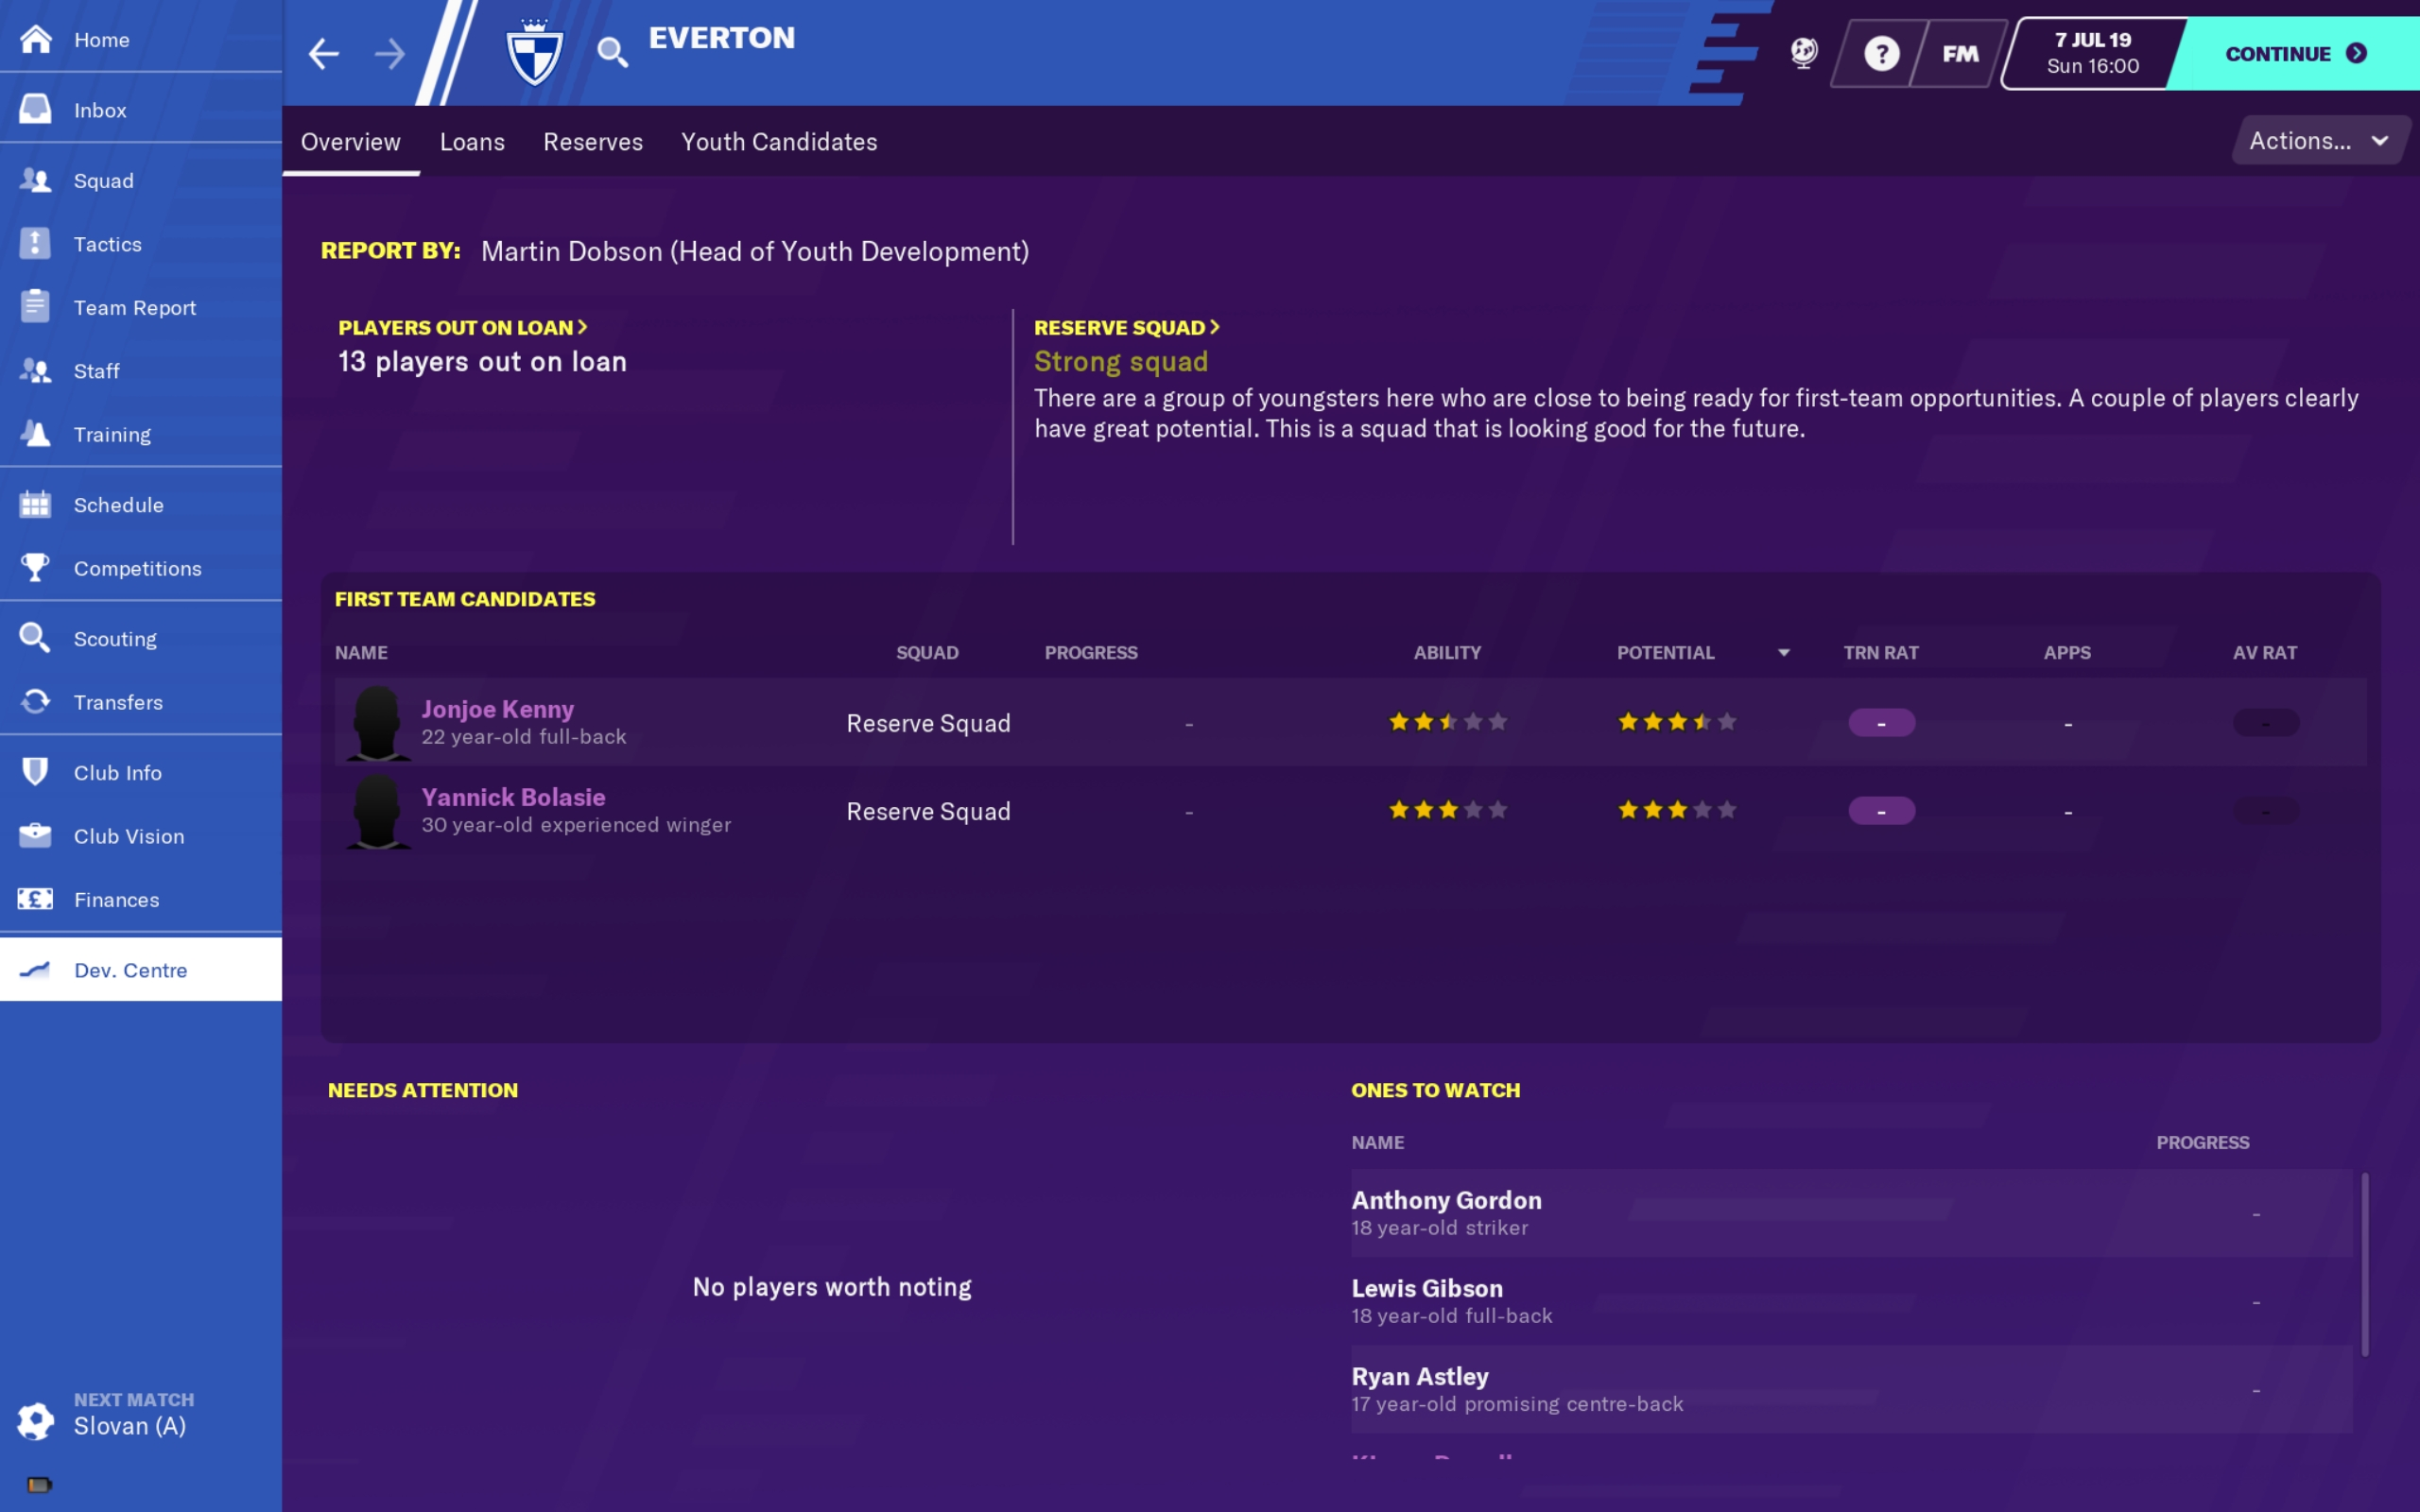 Обзор Football Manager 2020 Touch - «Стильно сохраняет титул»